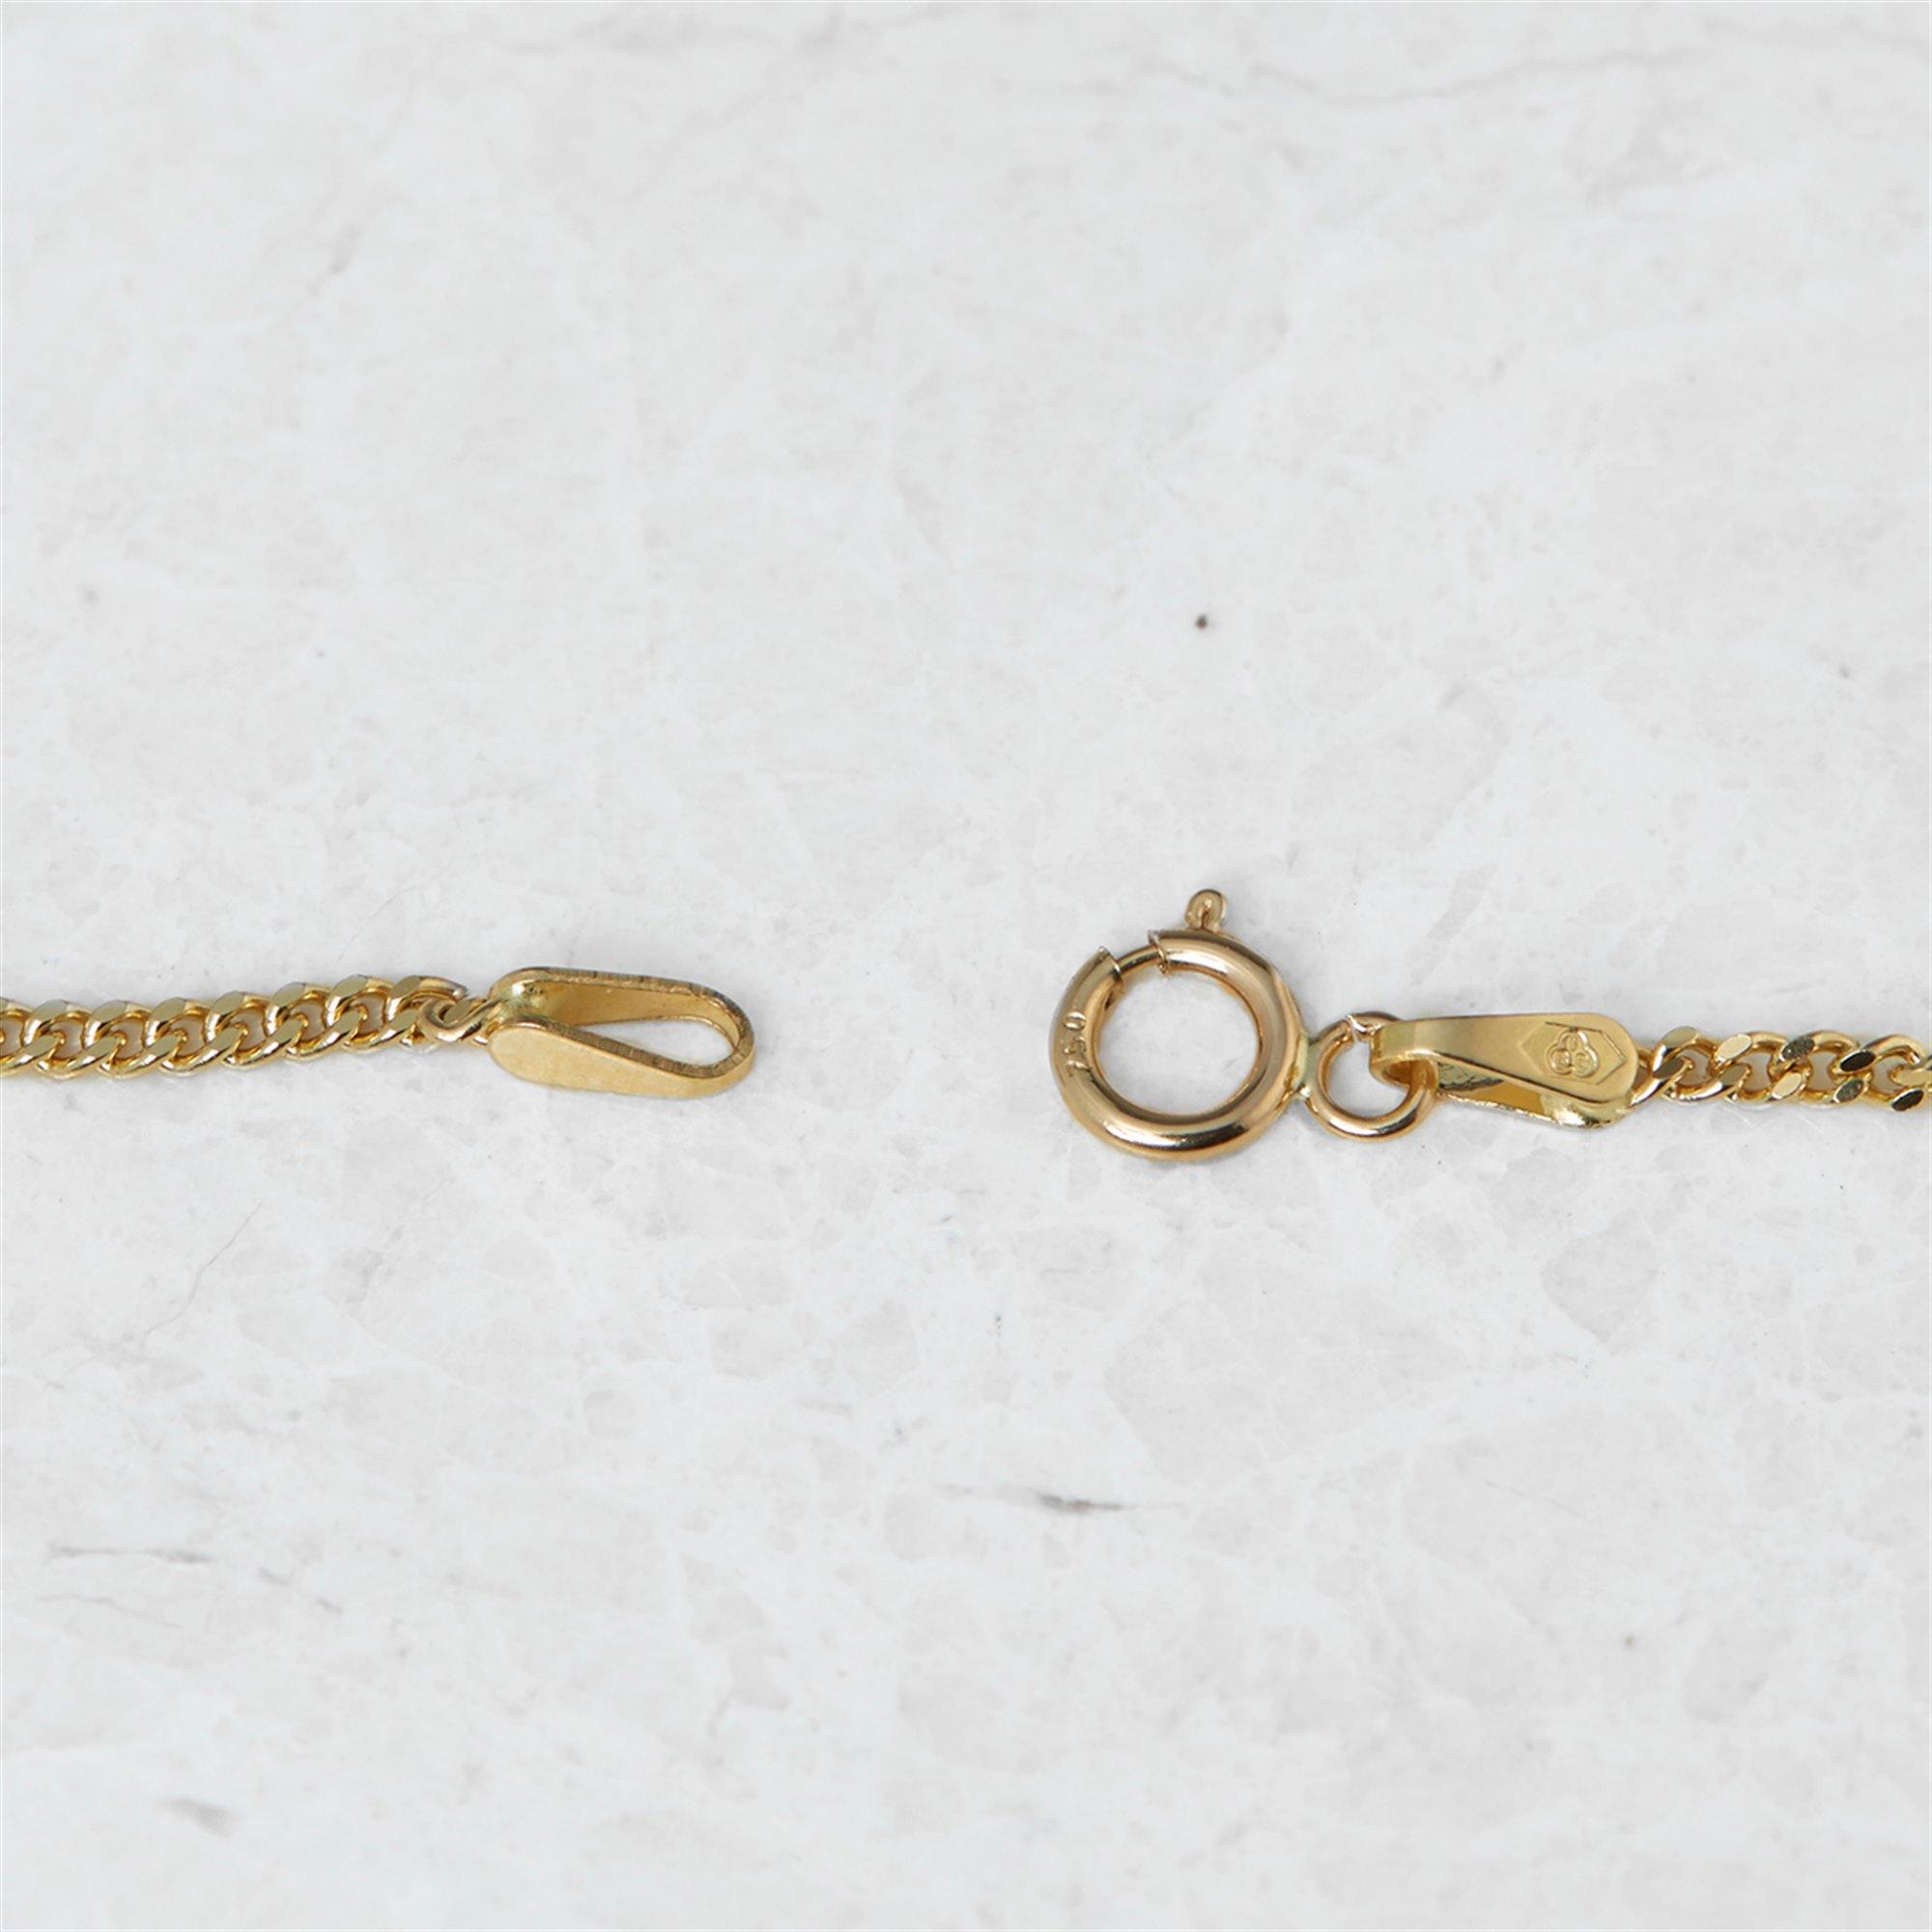 Audemars Piguet 18k Yellow Gold Mabe Pearl & Diamond Pendant Necklace